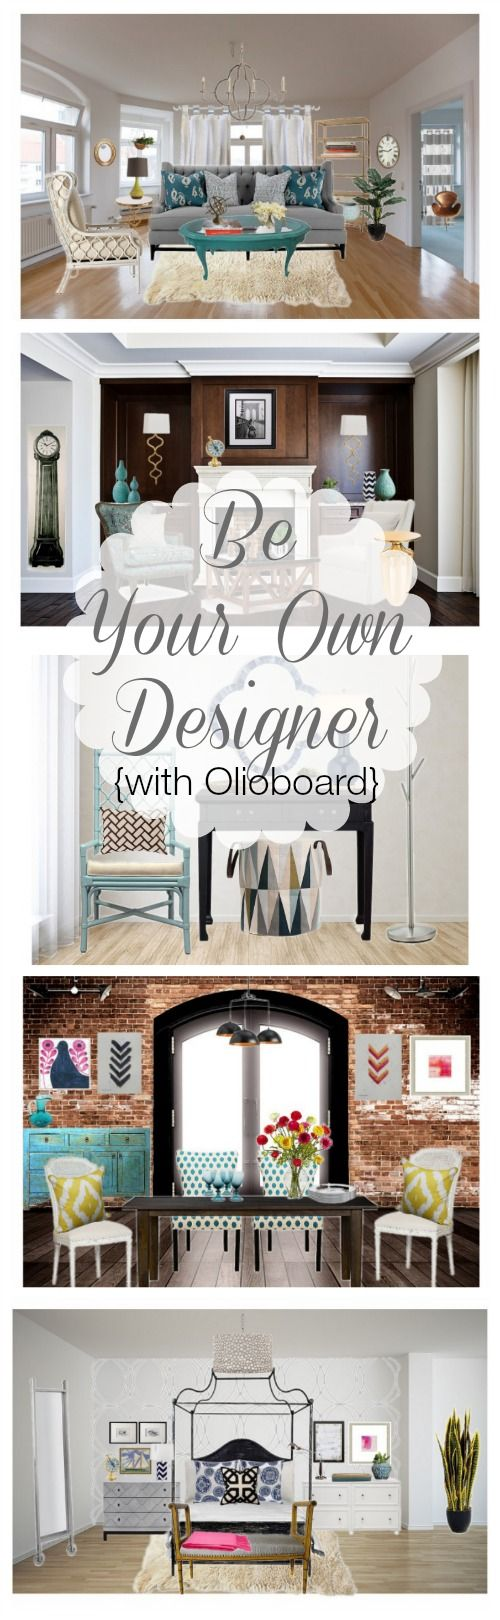 best creative house images on pinterest home ideas good ideas